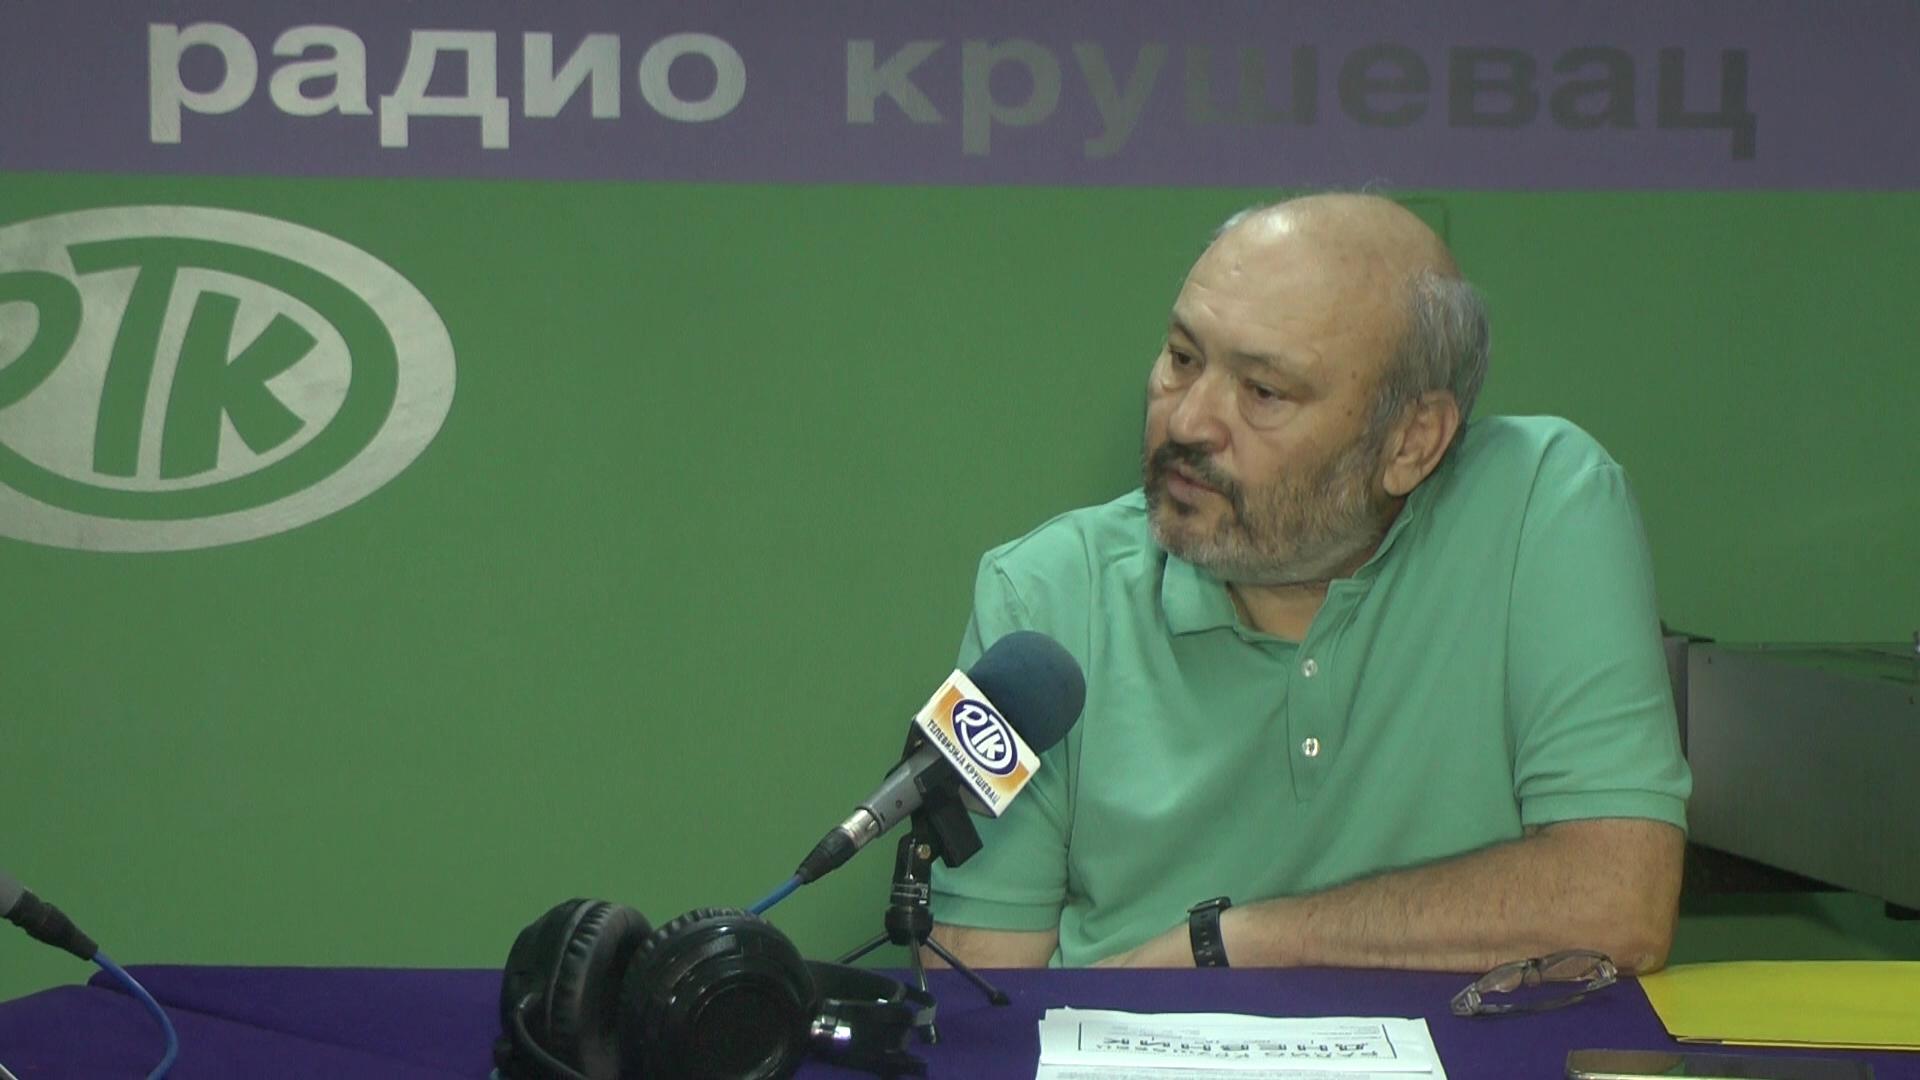 Kako je radio radio: Dragan Bošković